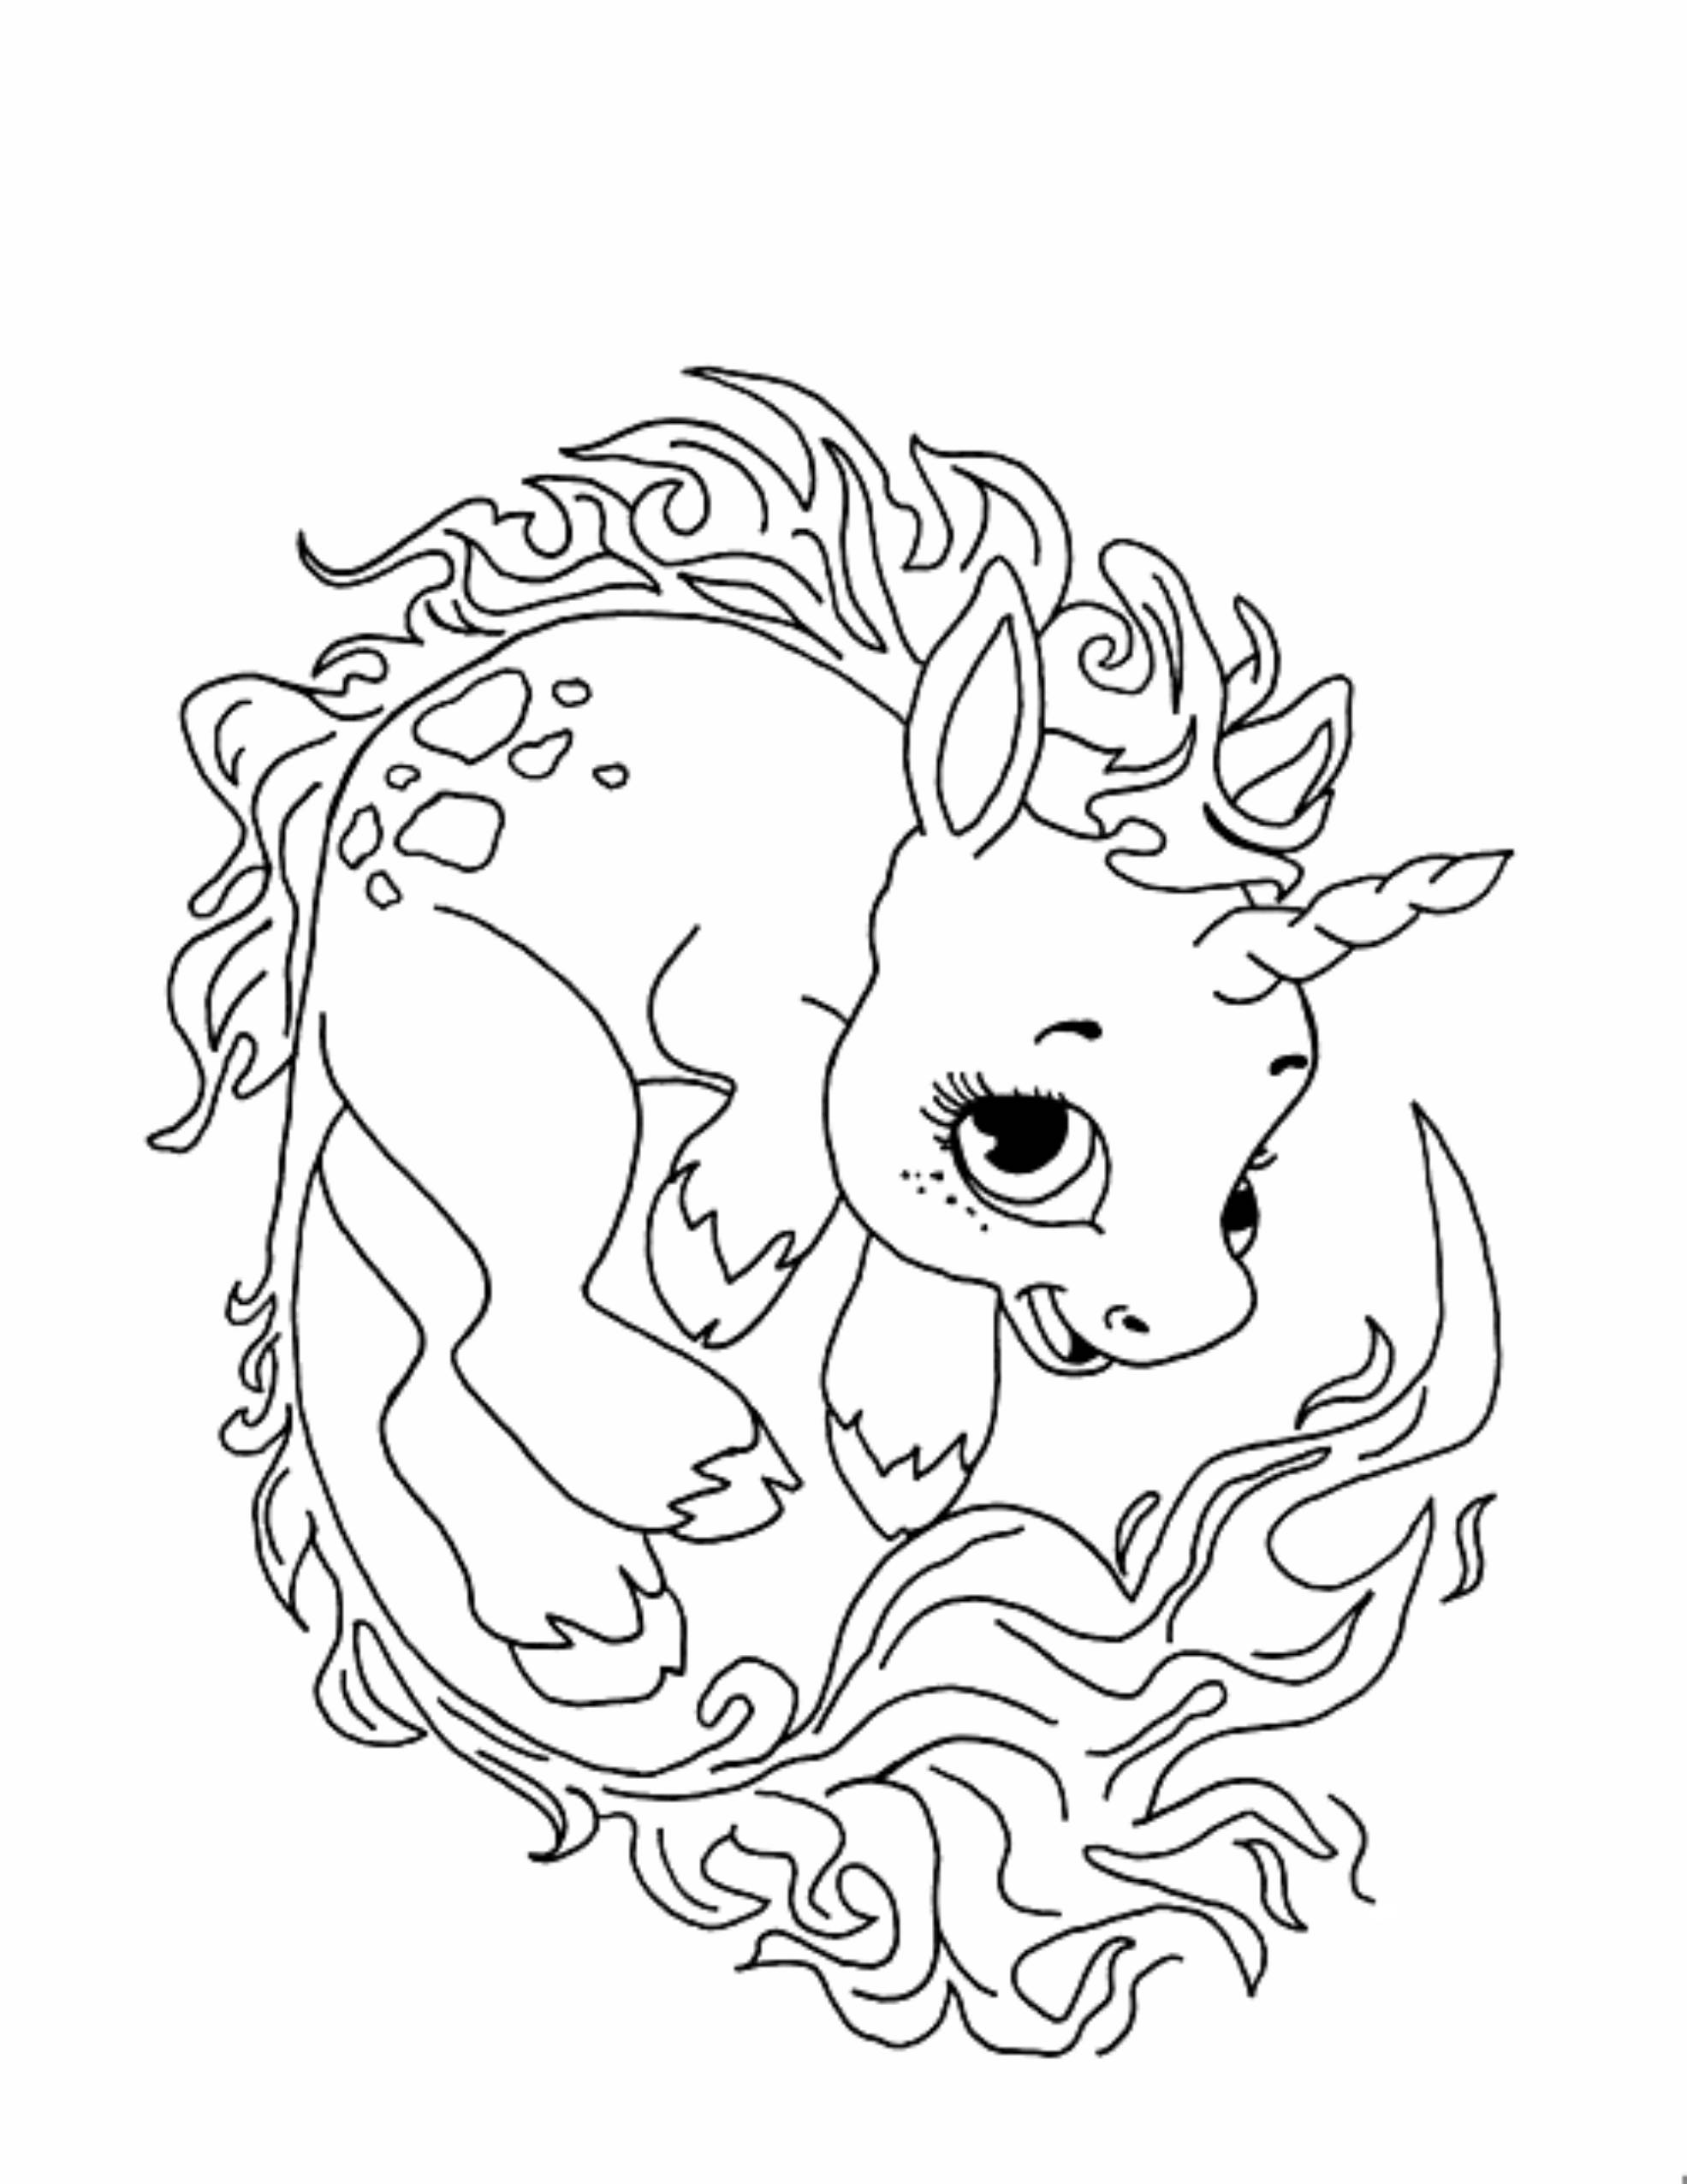 unicorn pictures printable lovely unicorn coloring page free printable coloring pages pictures unicorn printable